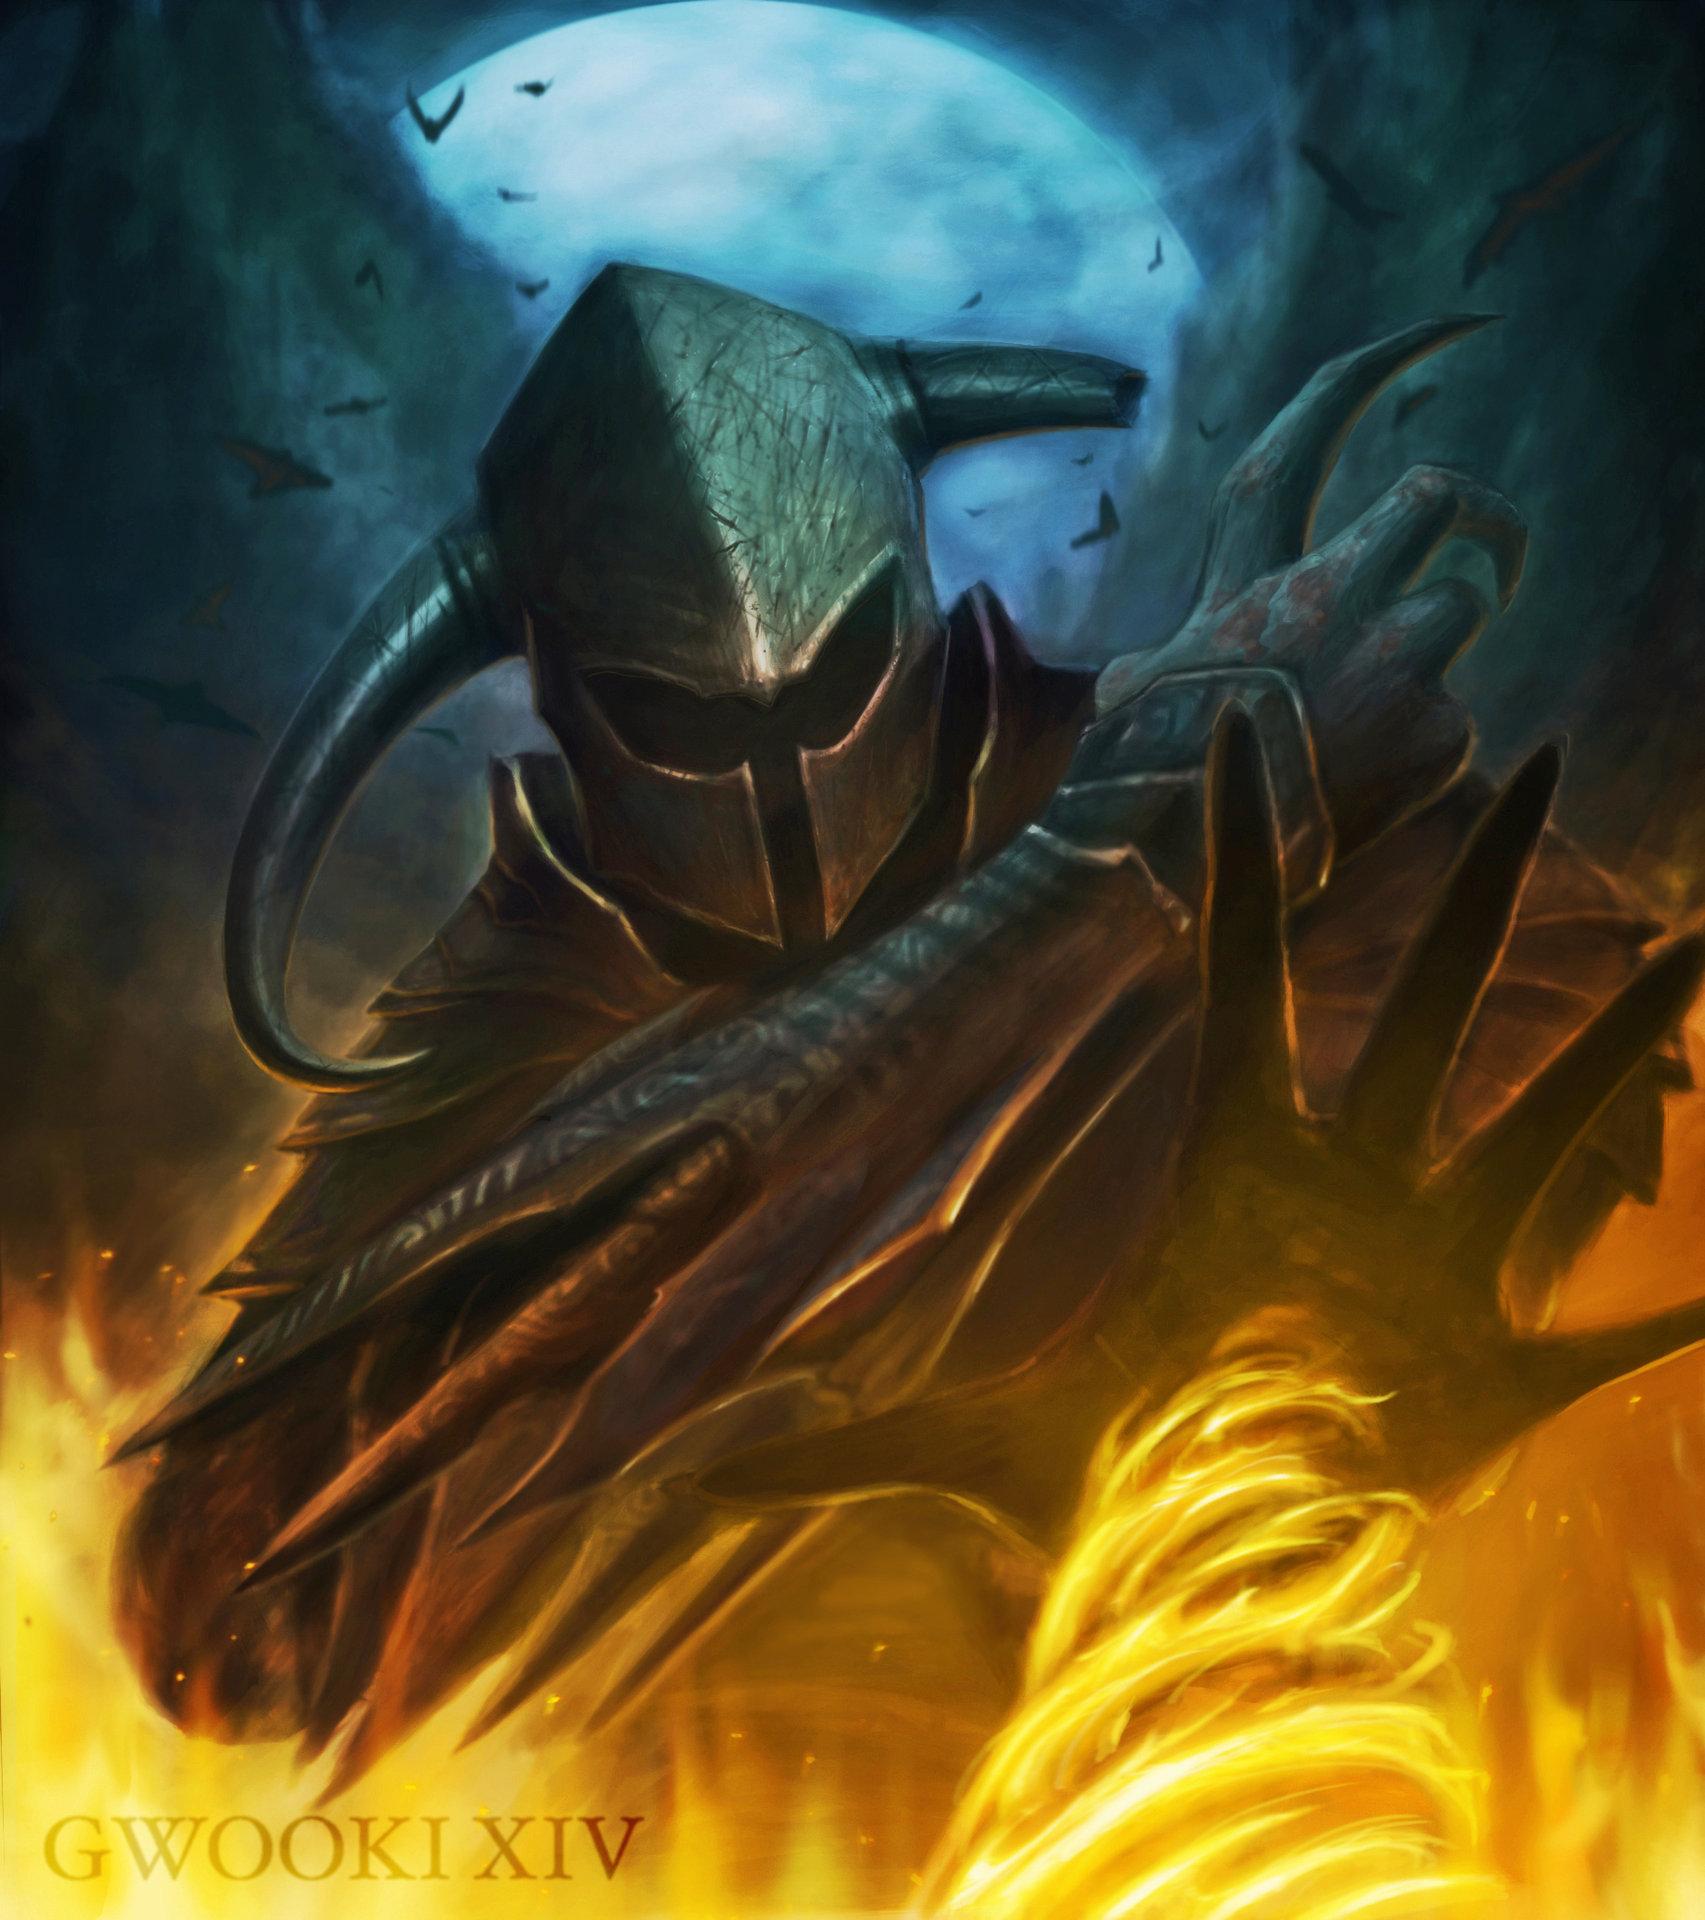 gwooki knight with elemental powers